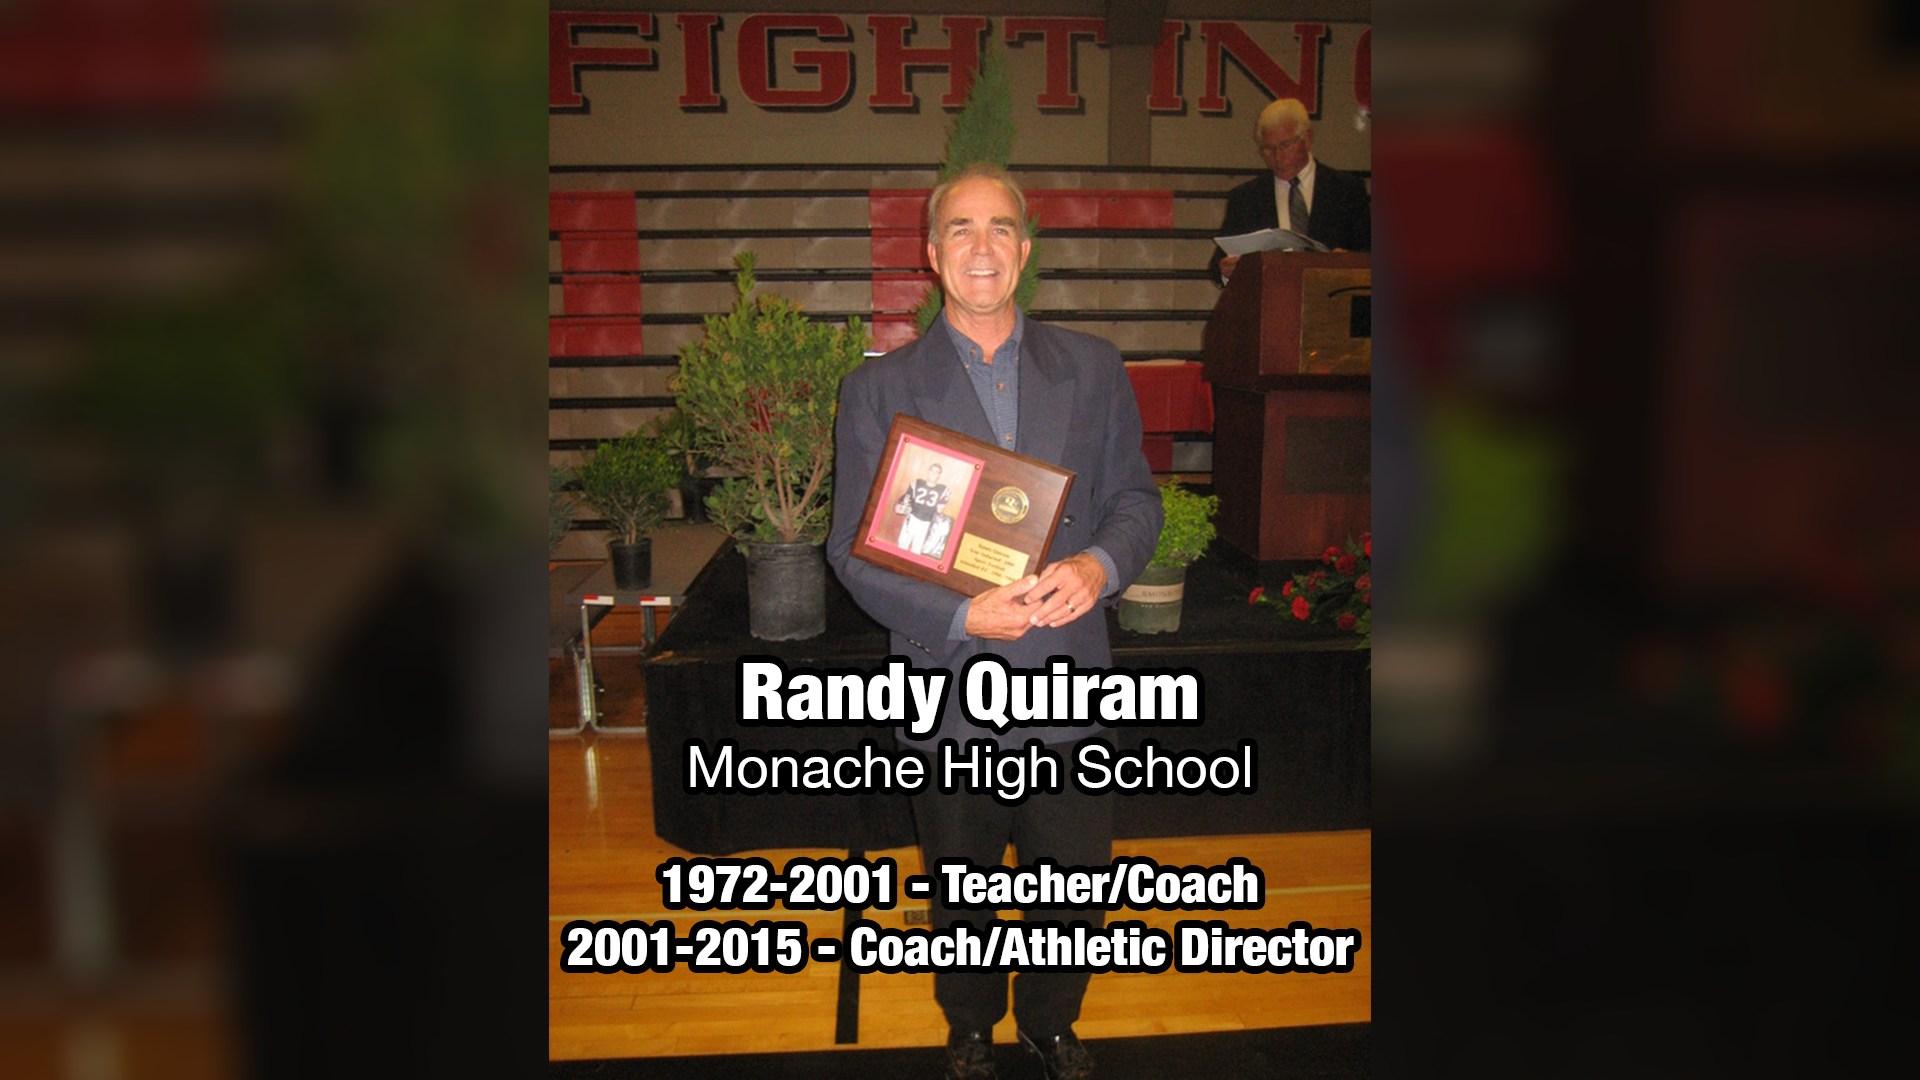 Randy Quiram